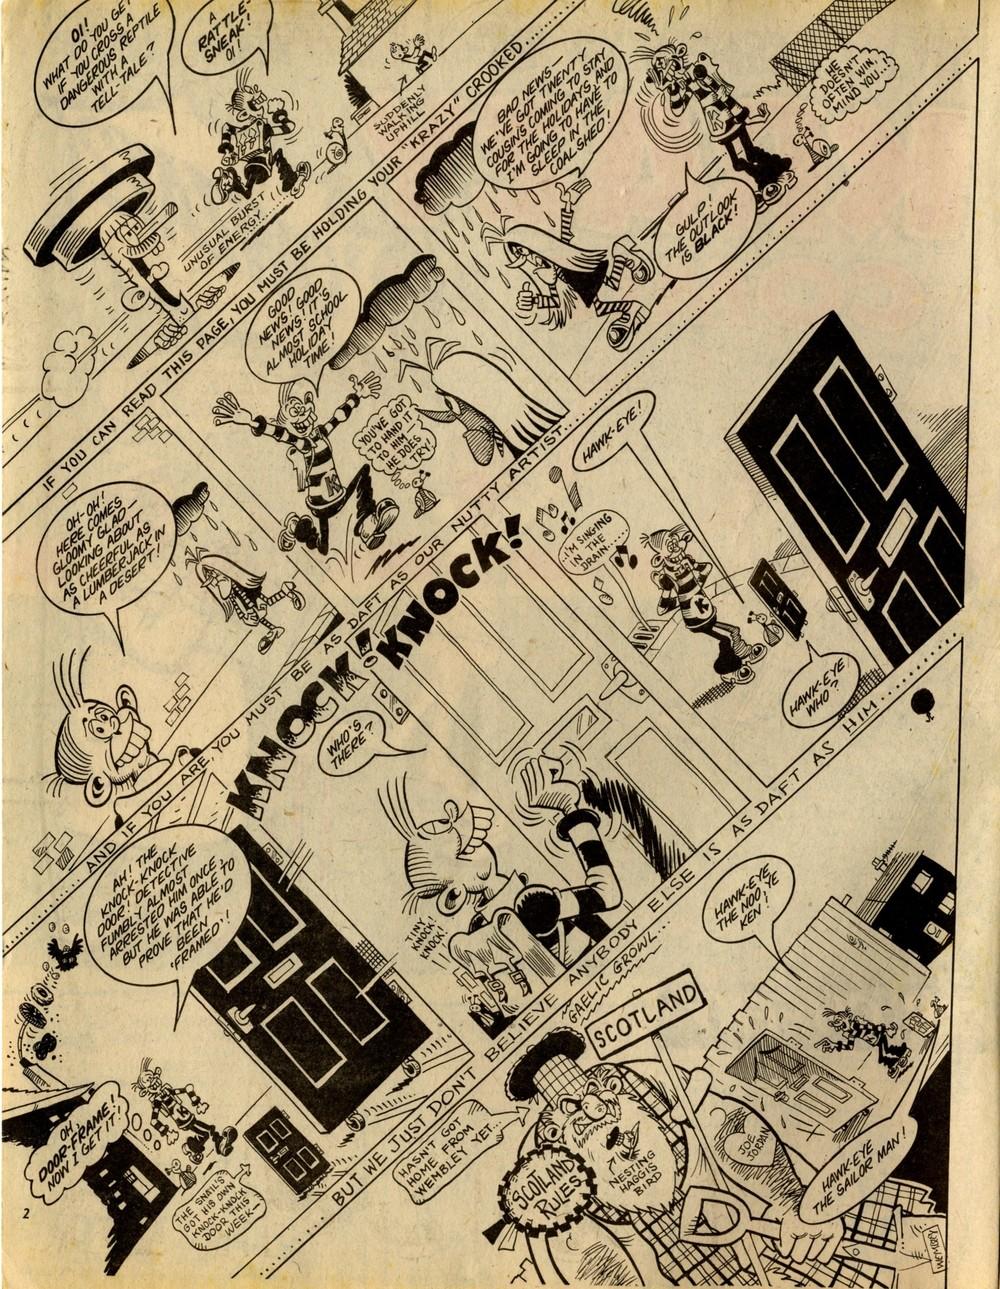 It's Cheeky: Frank McDiarmid (artist)